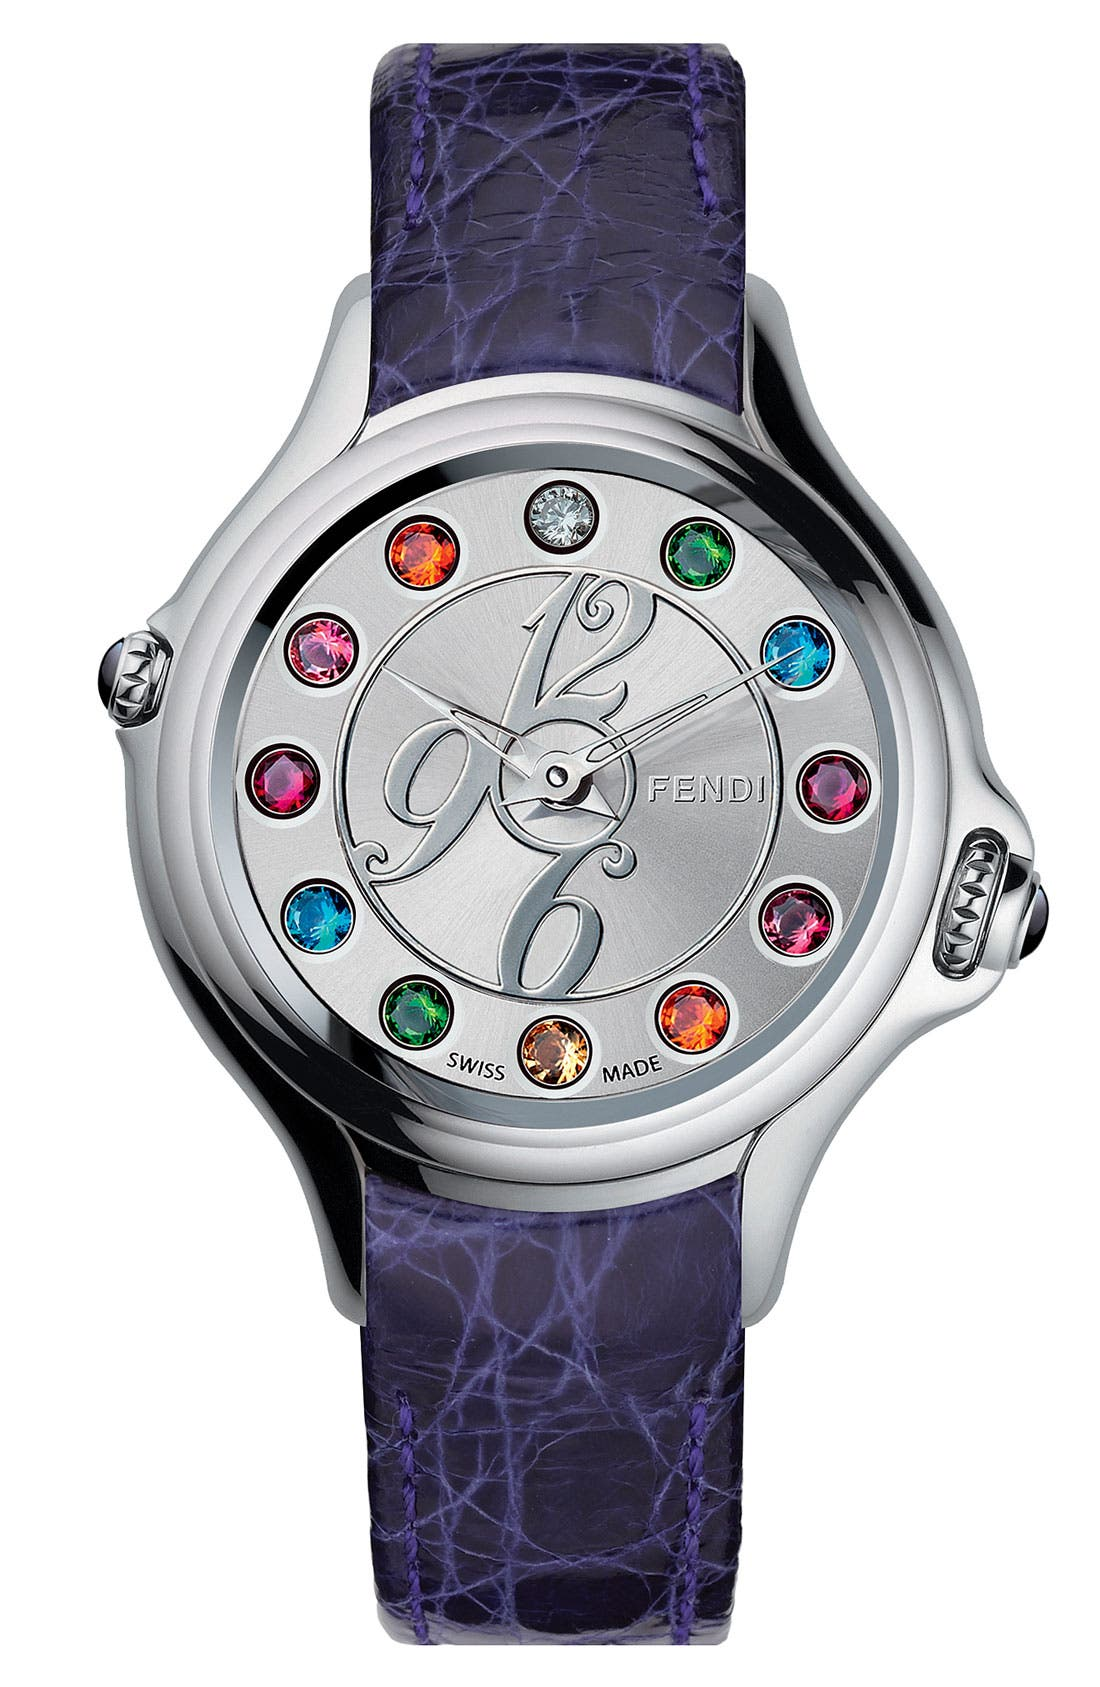 Alternate Image 1 Selected - Fendi 'Crazy Carats' Teju Lizardskin Strap Watch, 38mm